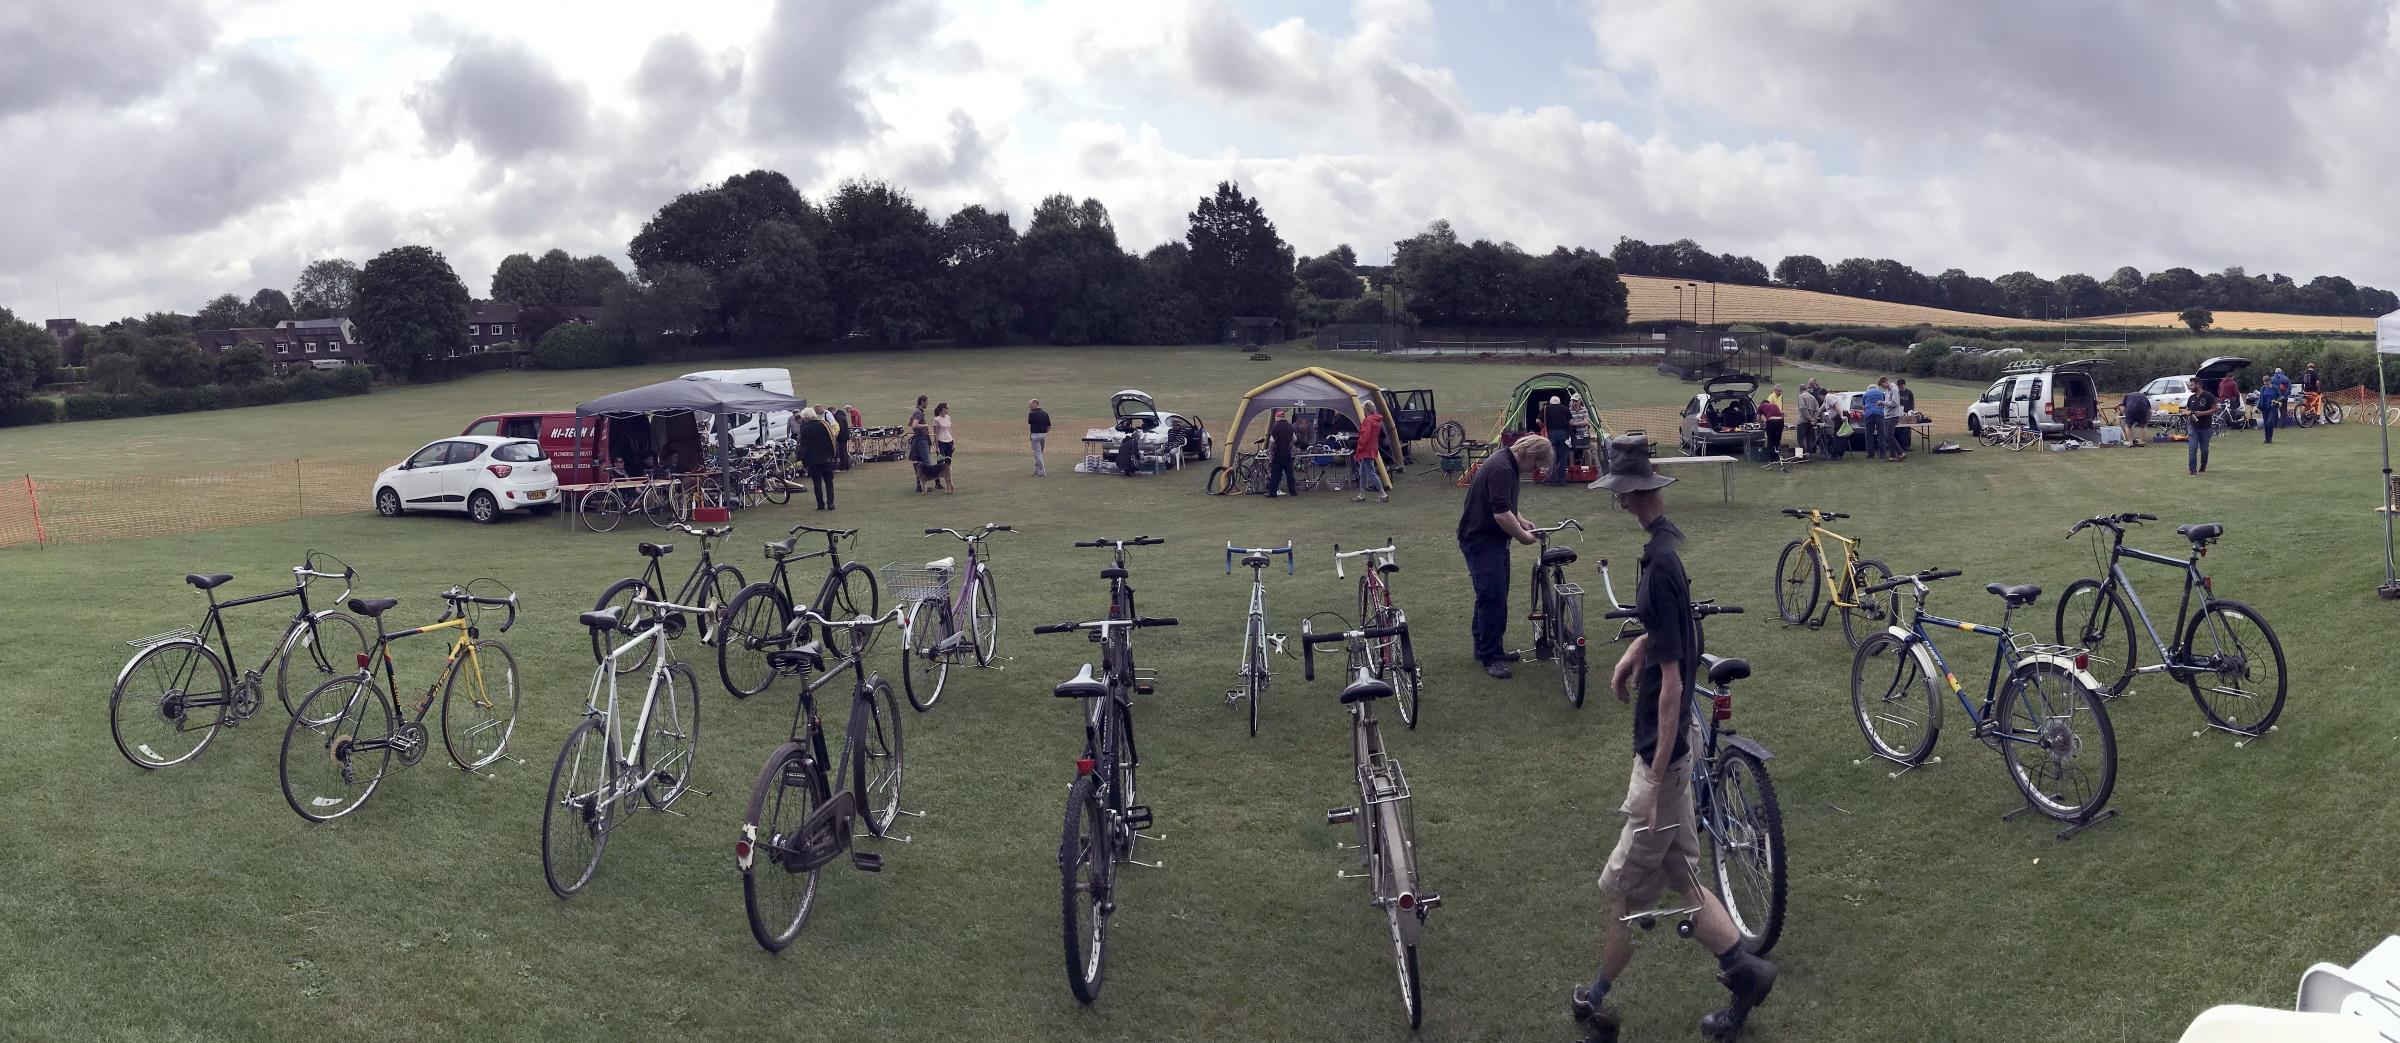 Cycle Jumble July 2019 at Cheriton Recreation Ground